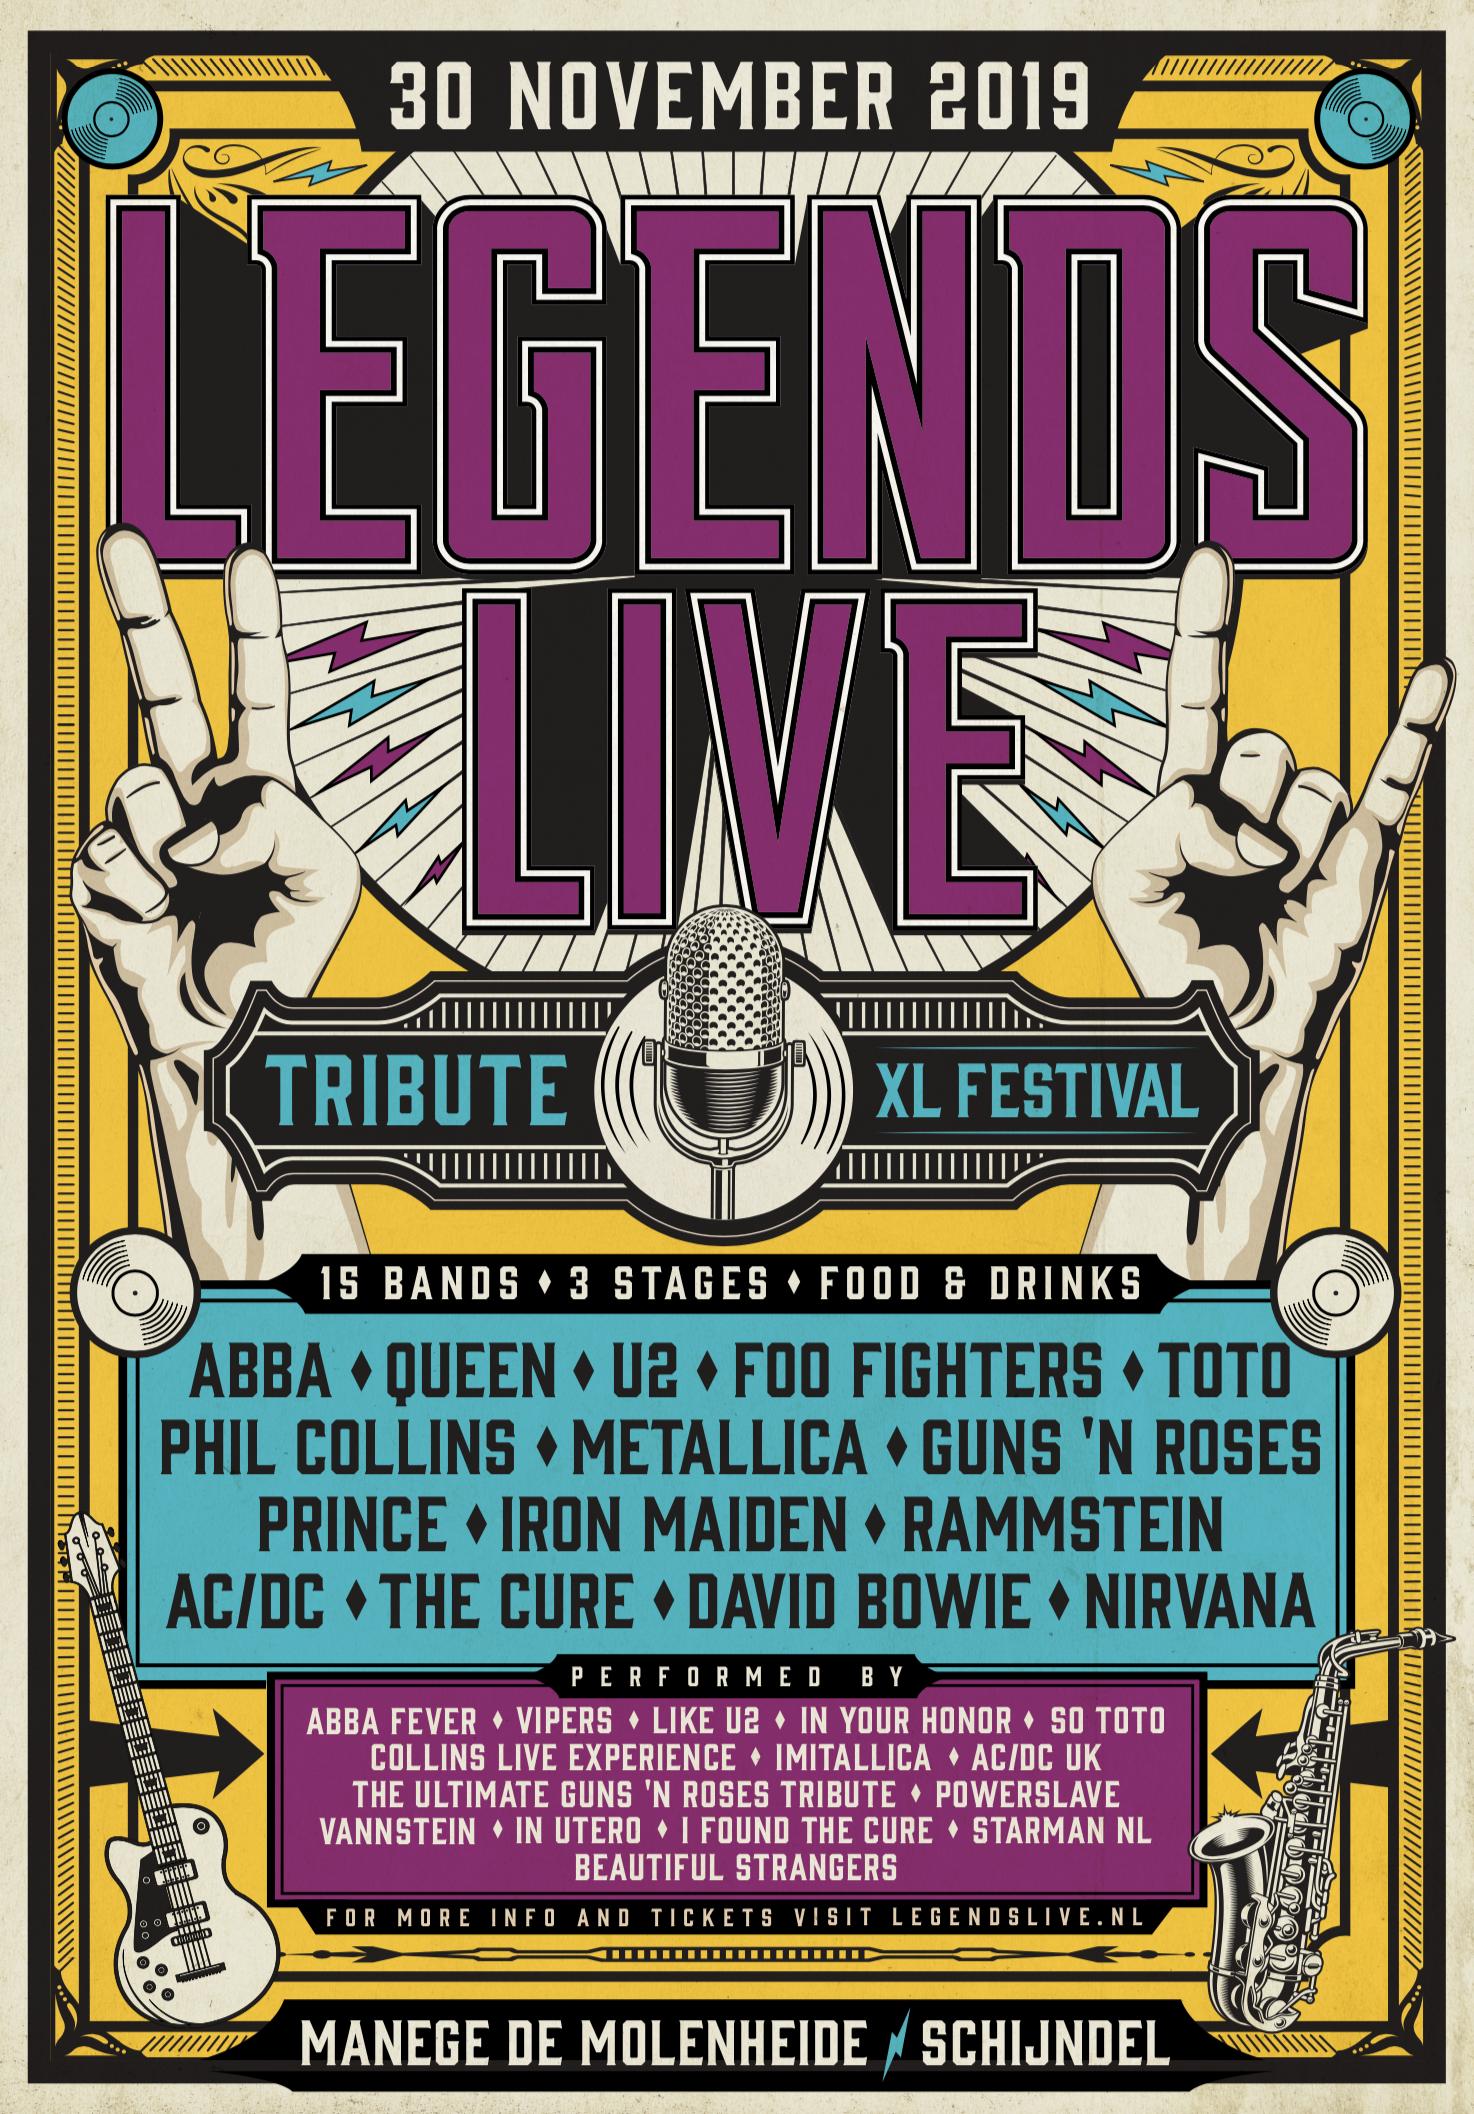 XXL-editie 'Legends Live–XL Festival' manege de Molenheide